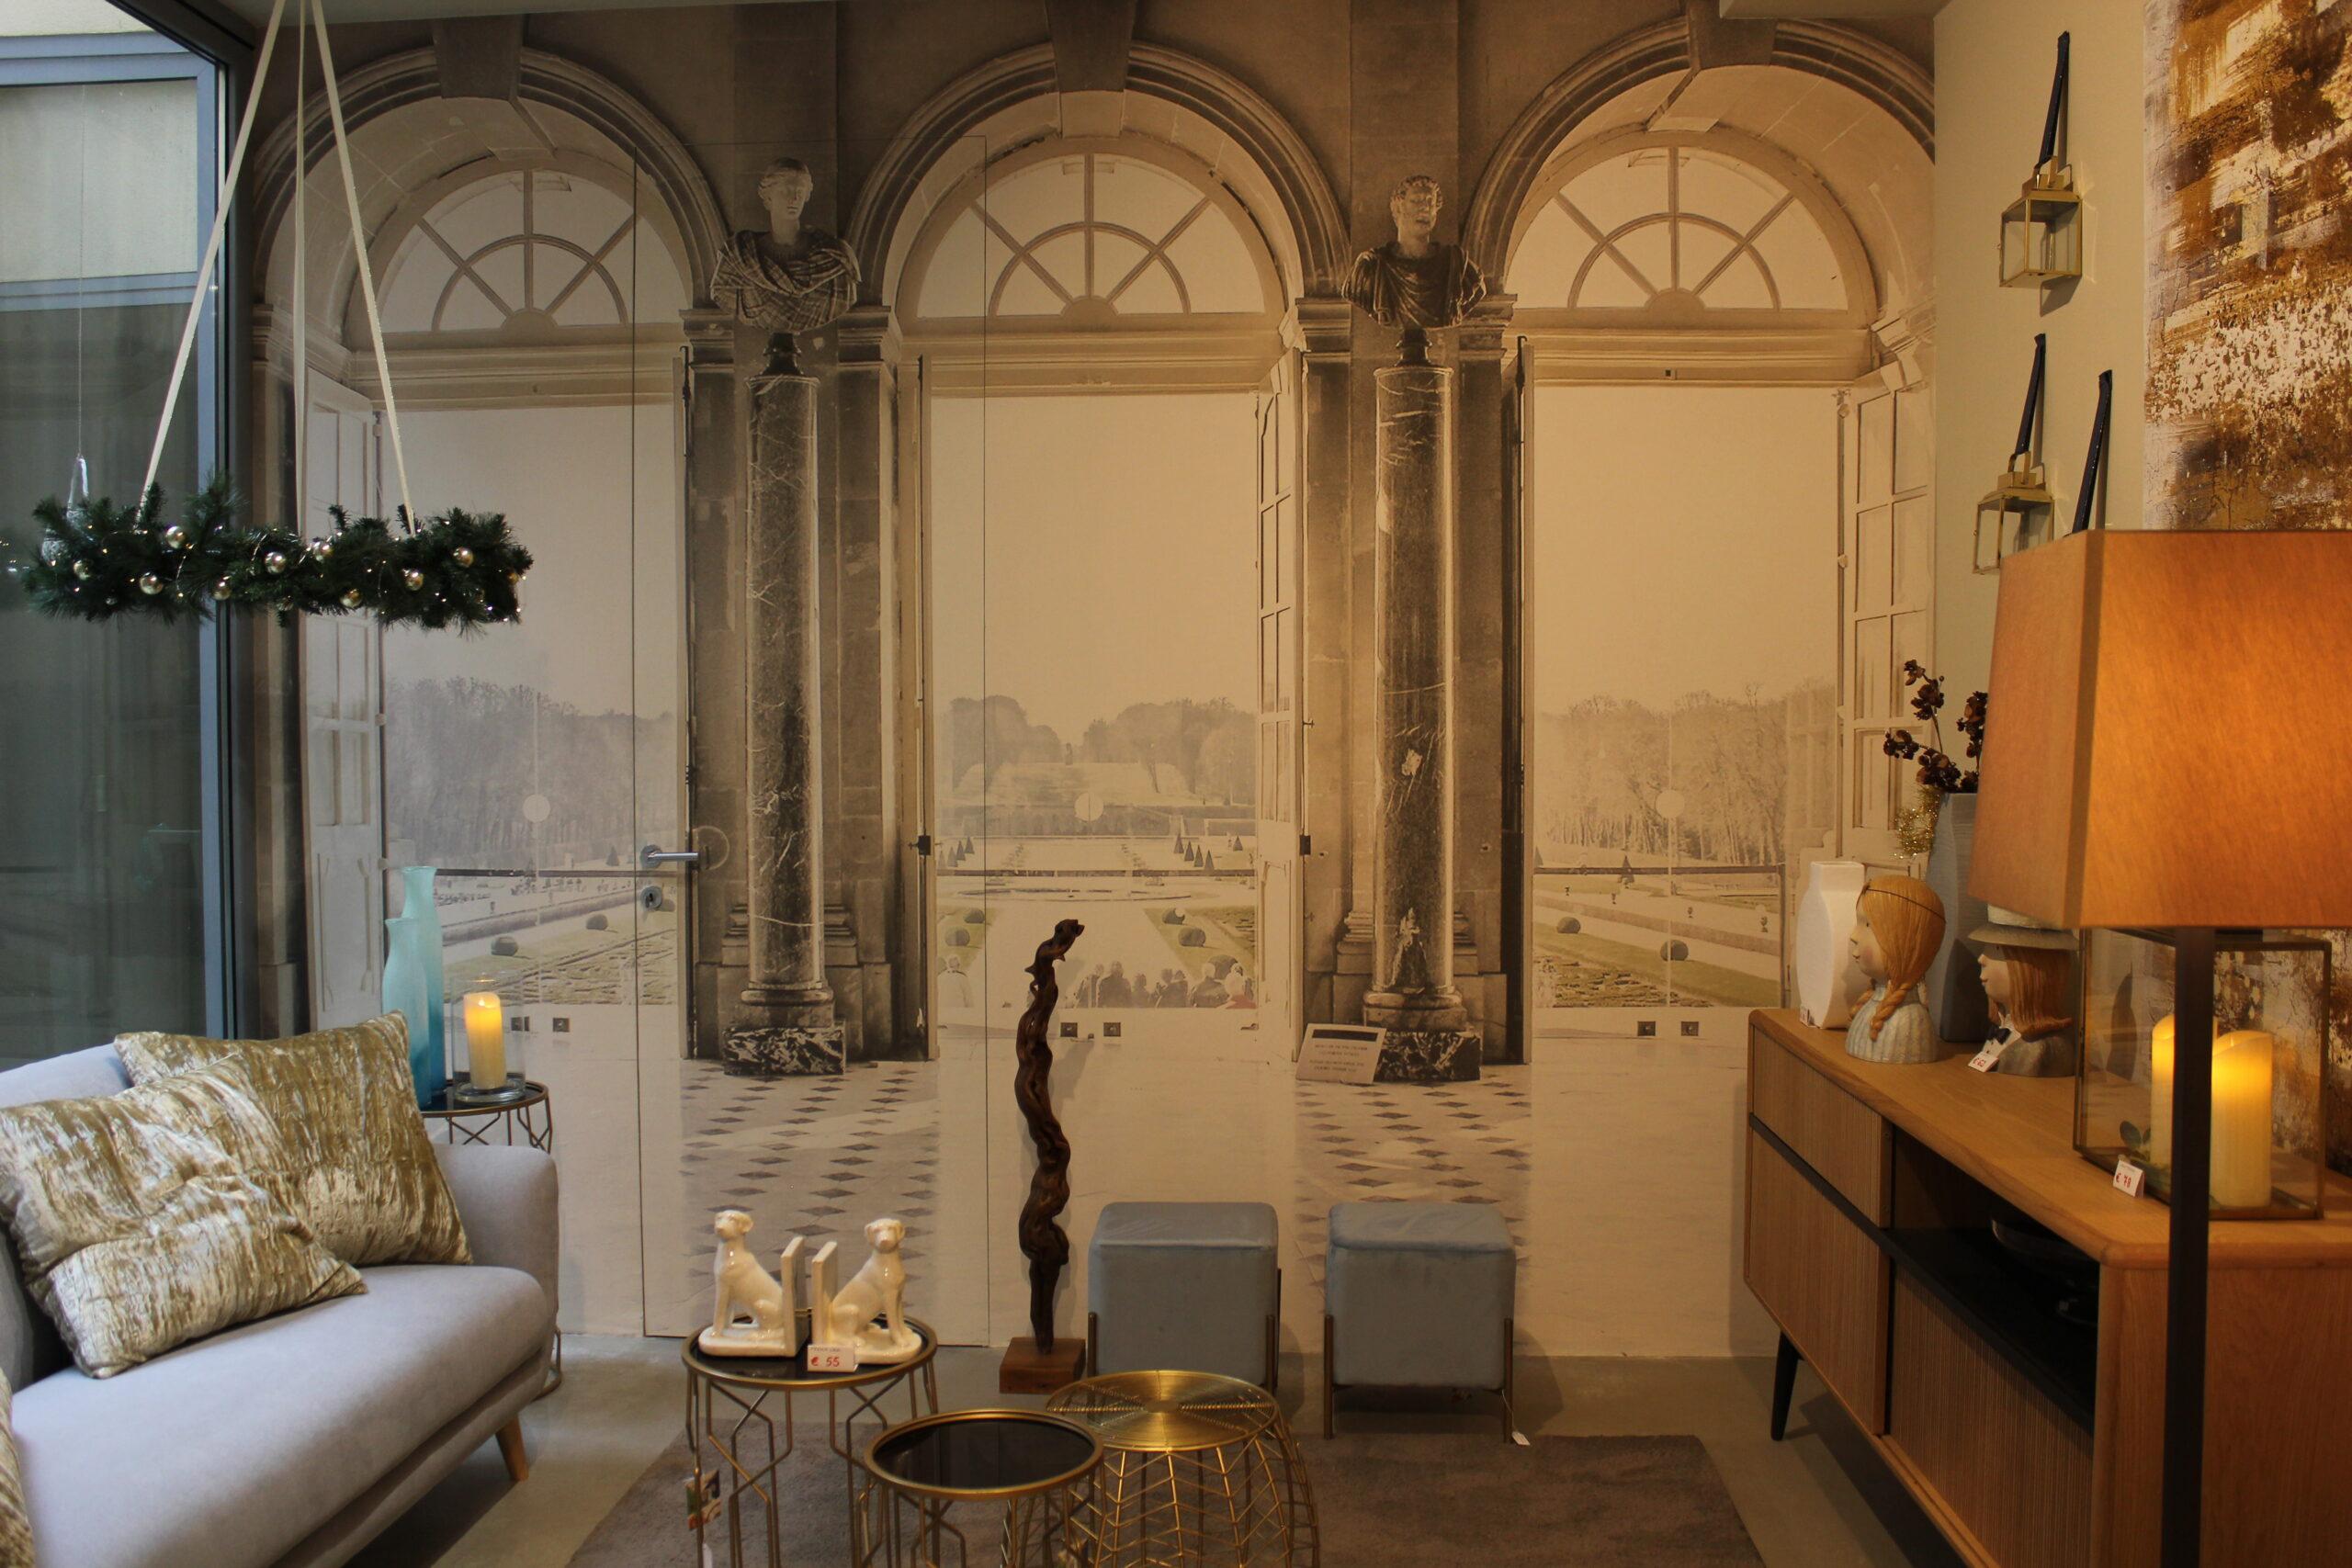 Vibo-wallpaper